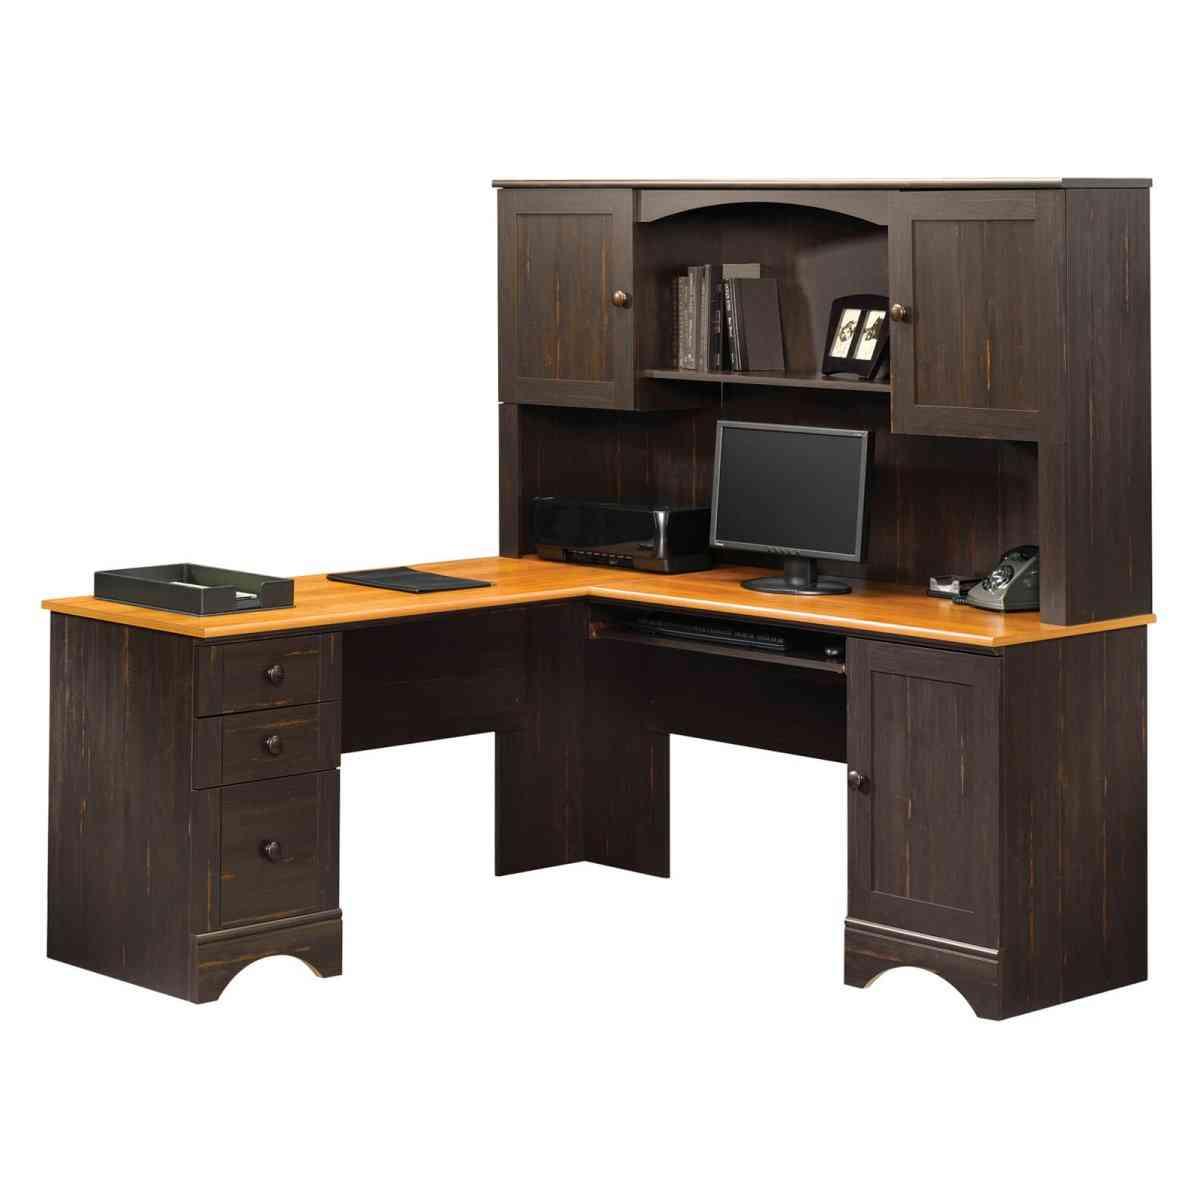 Sauder Corner Desk with Hutch  Decor IdeasDecor Ideas